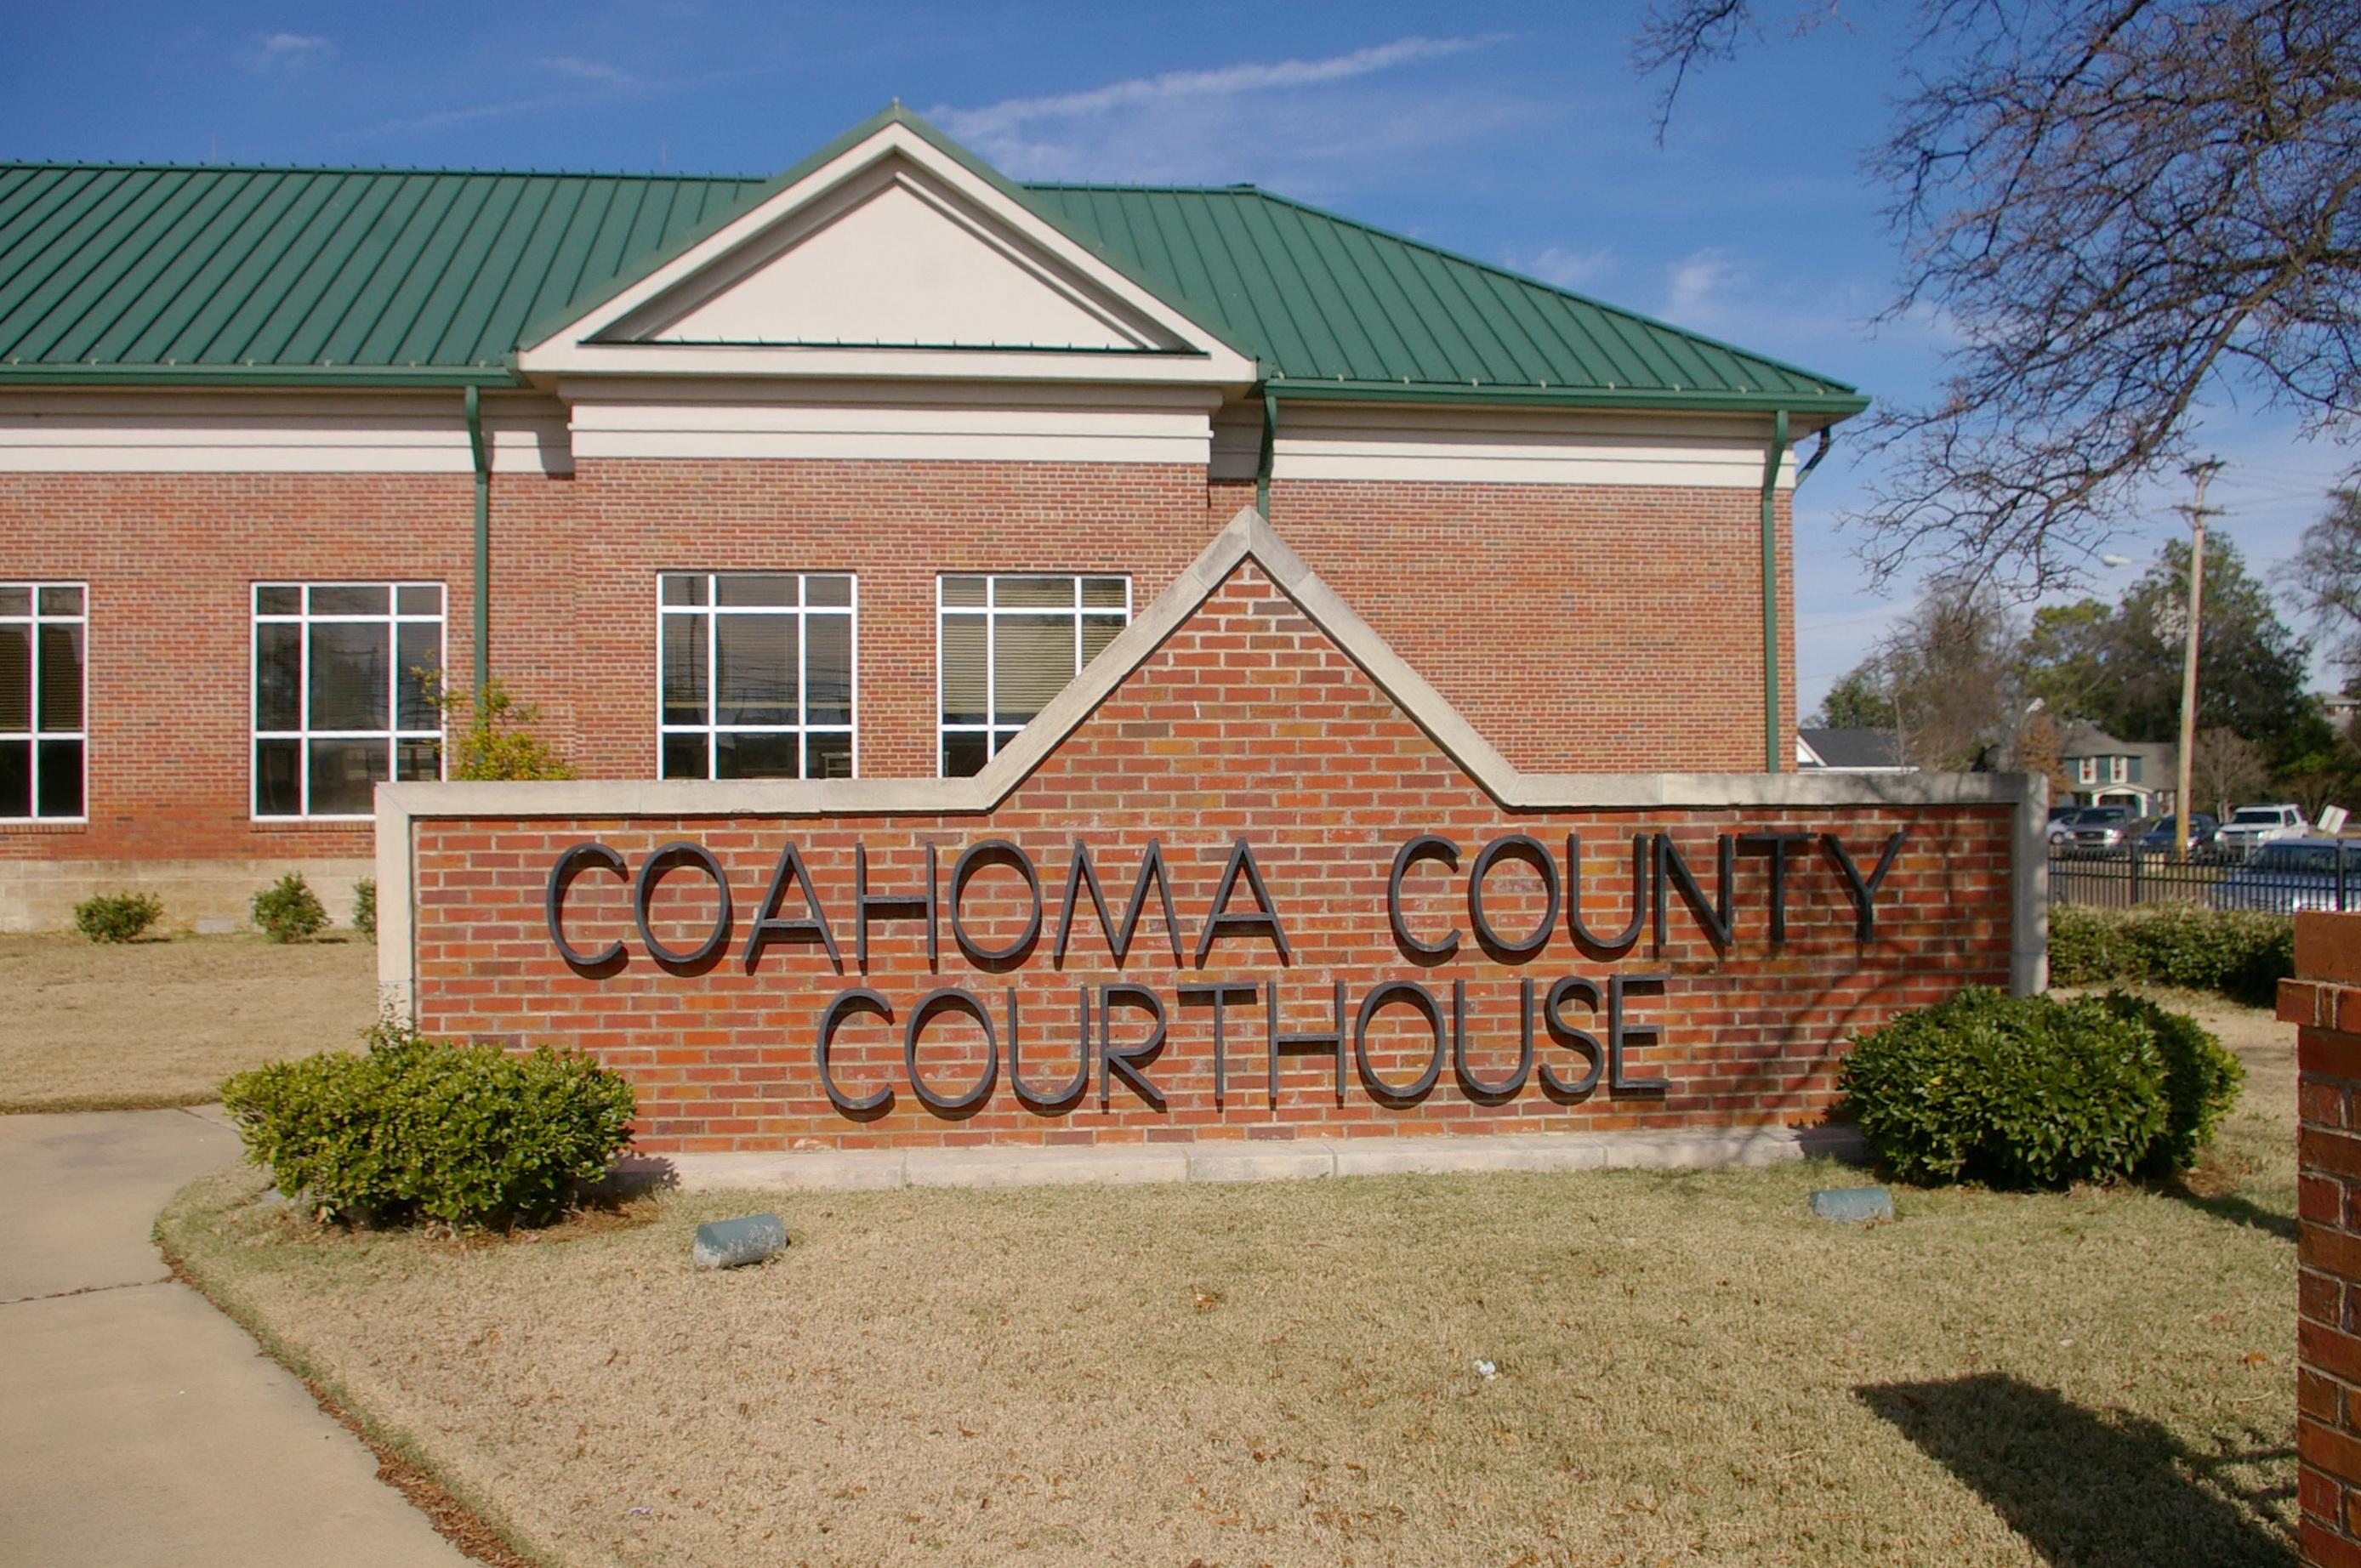 Mississippi coahoma county sherard - 0621m12